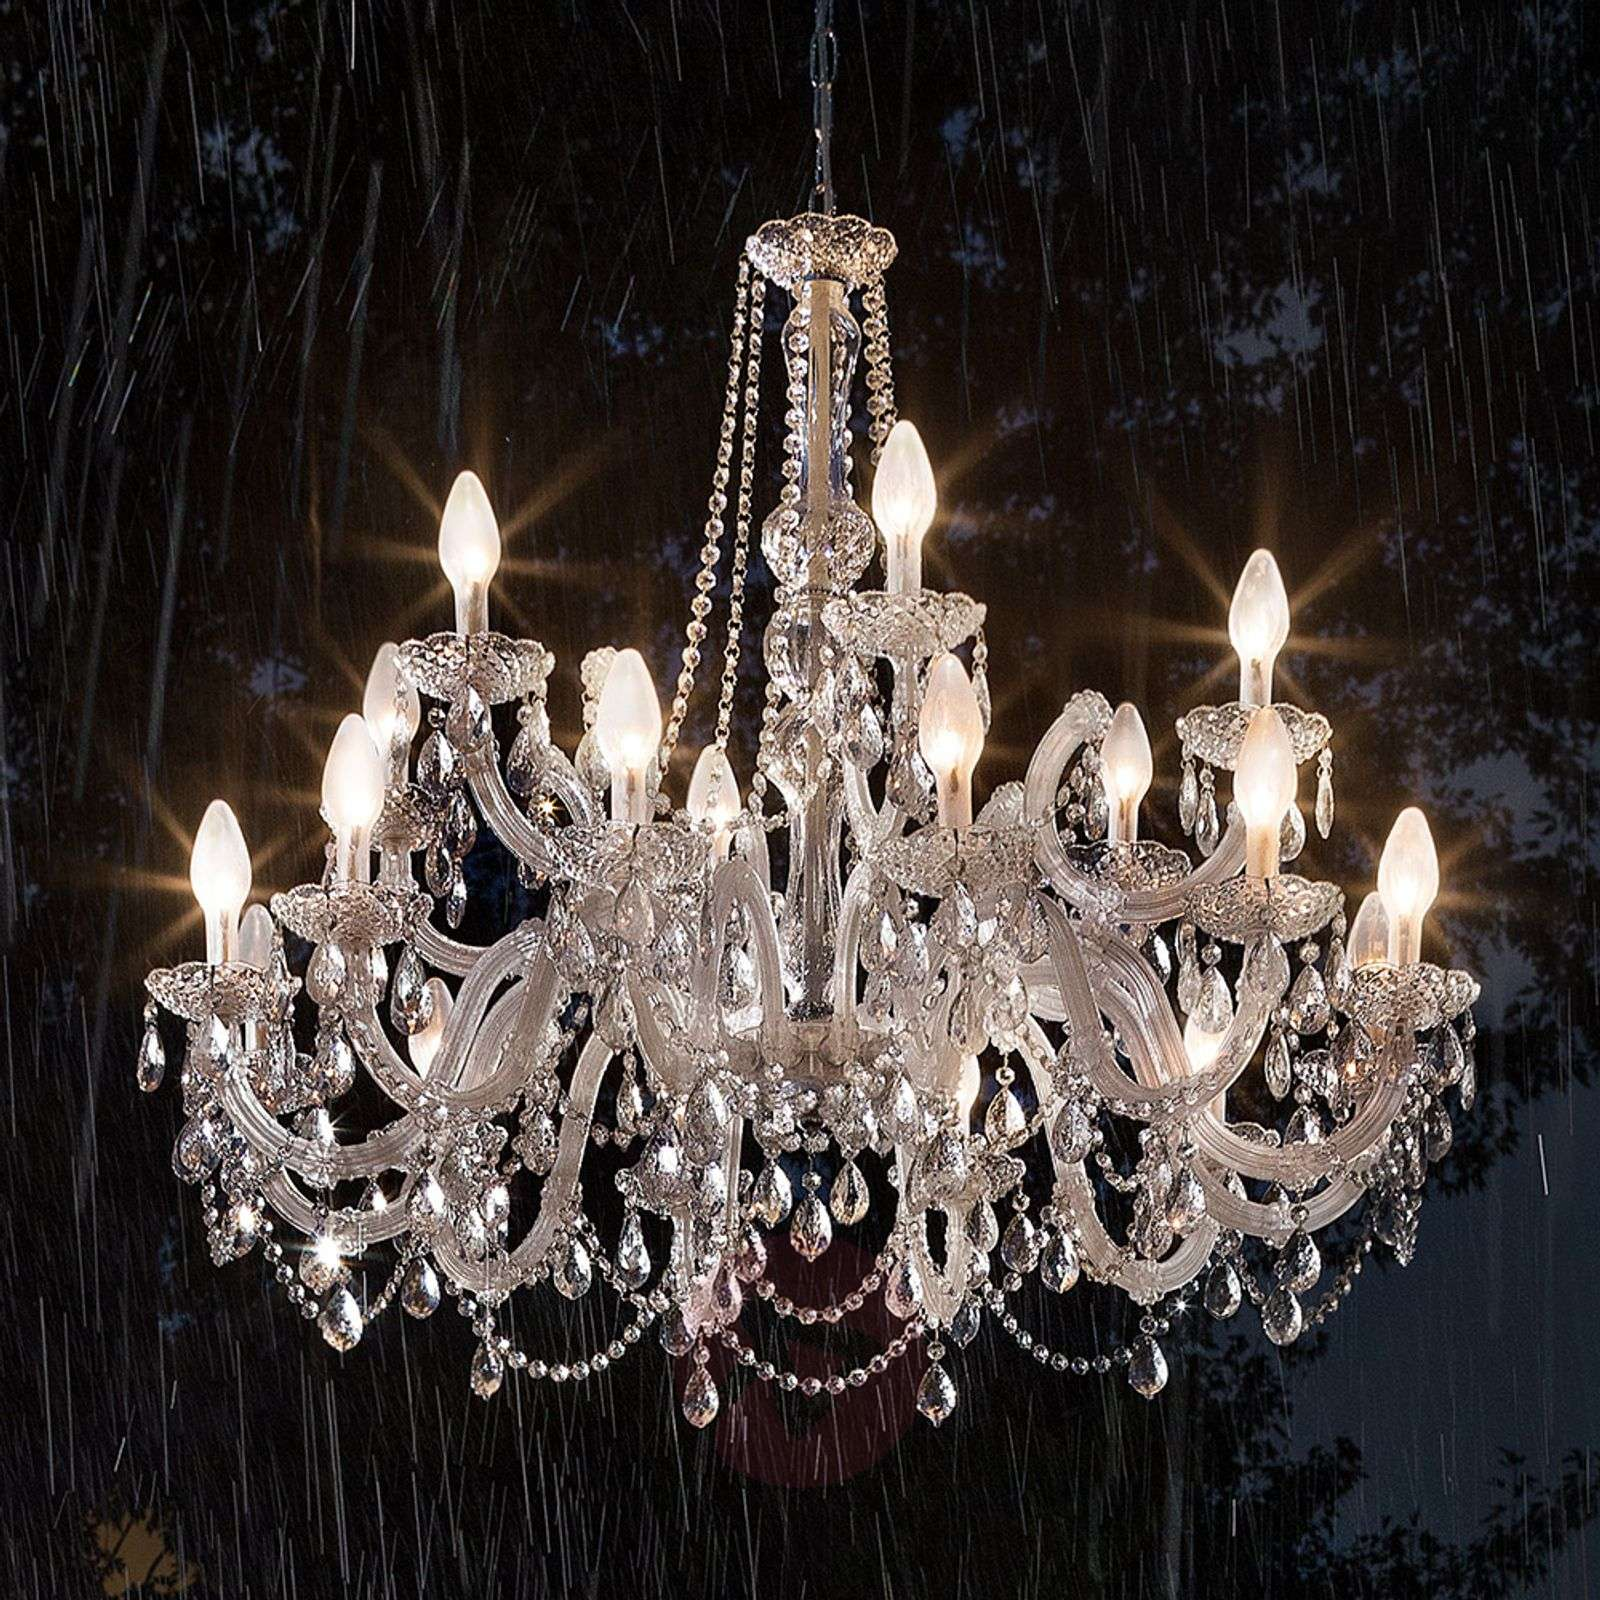 white filament supmart led warm dimmable bulb shape bulbs chandelier listed cri ul incandescent candles equivalent dp candelabra torpedo lumen